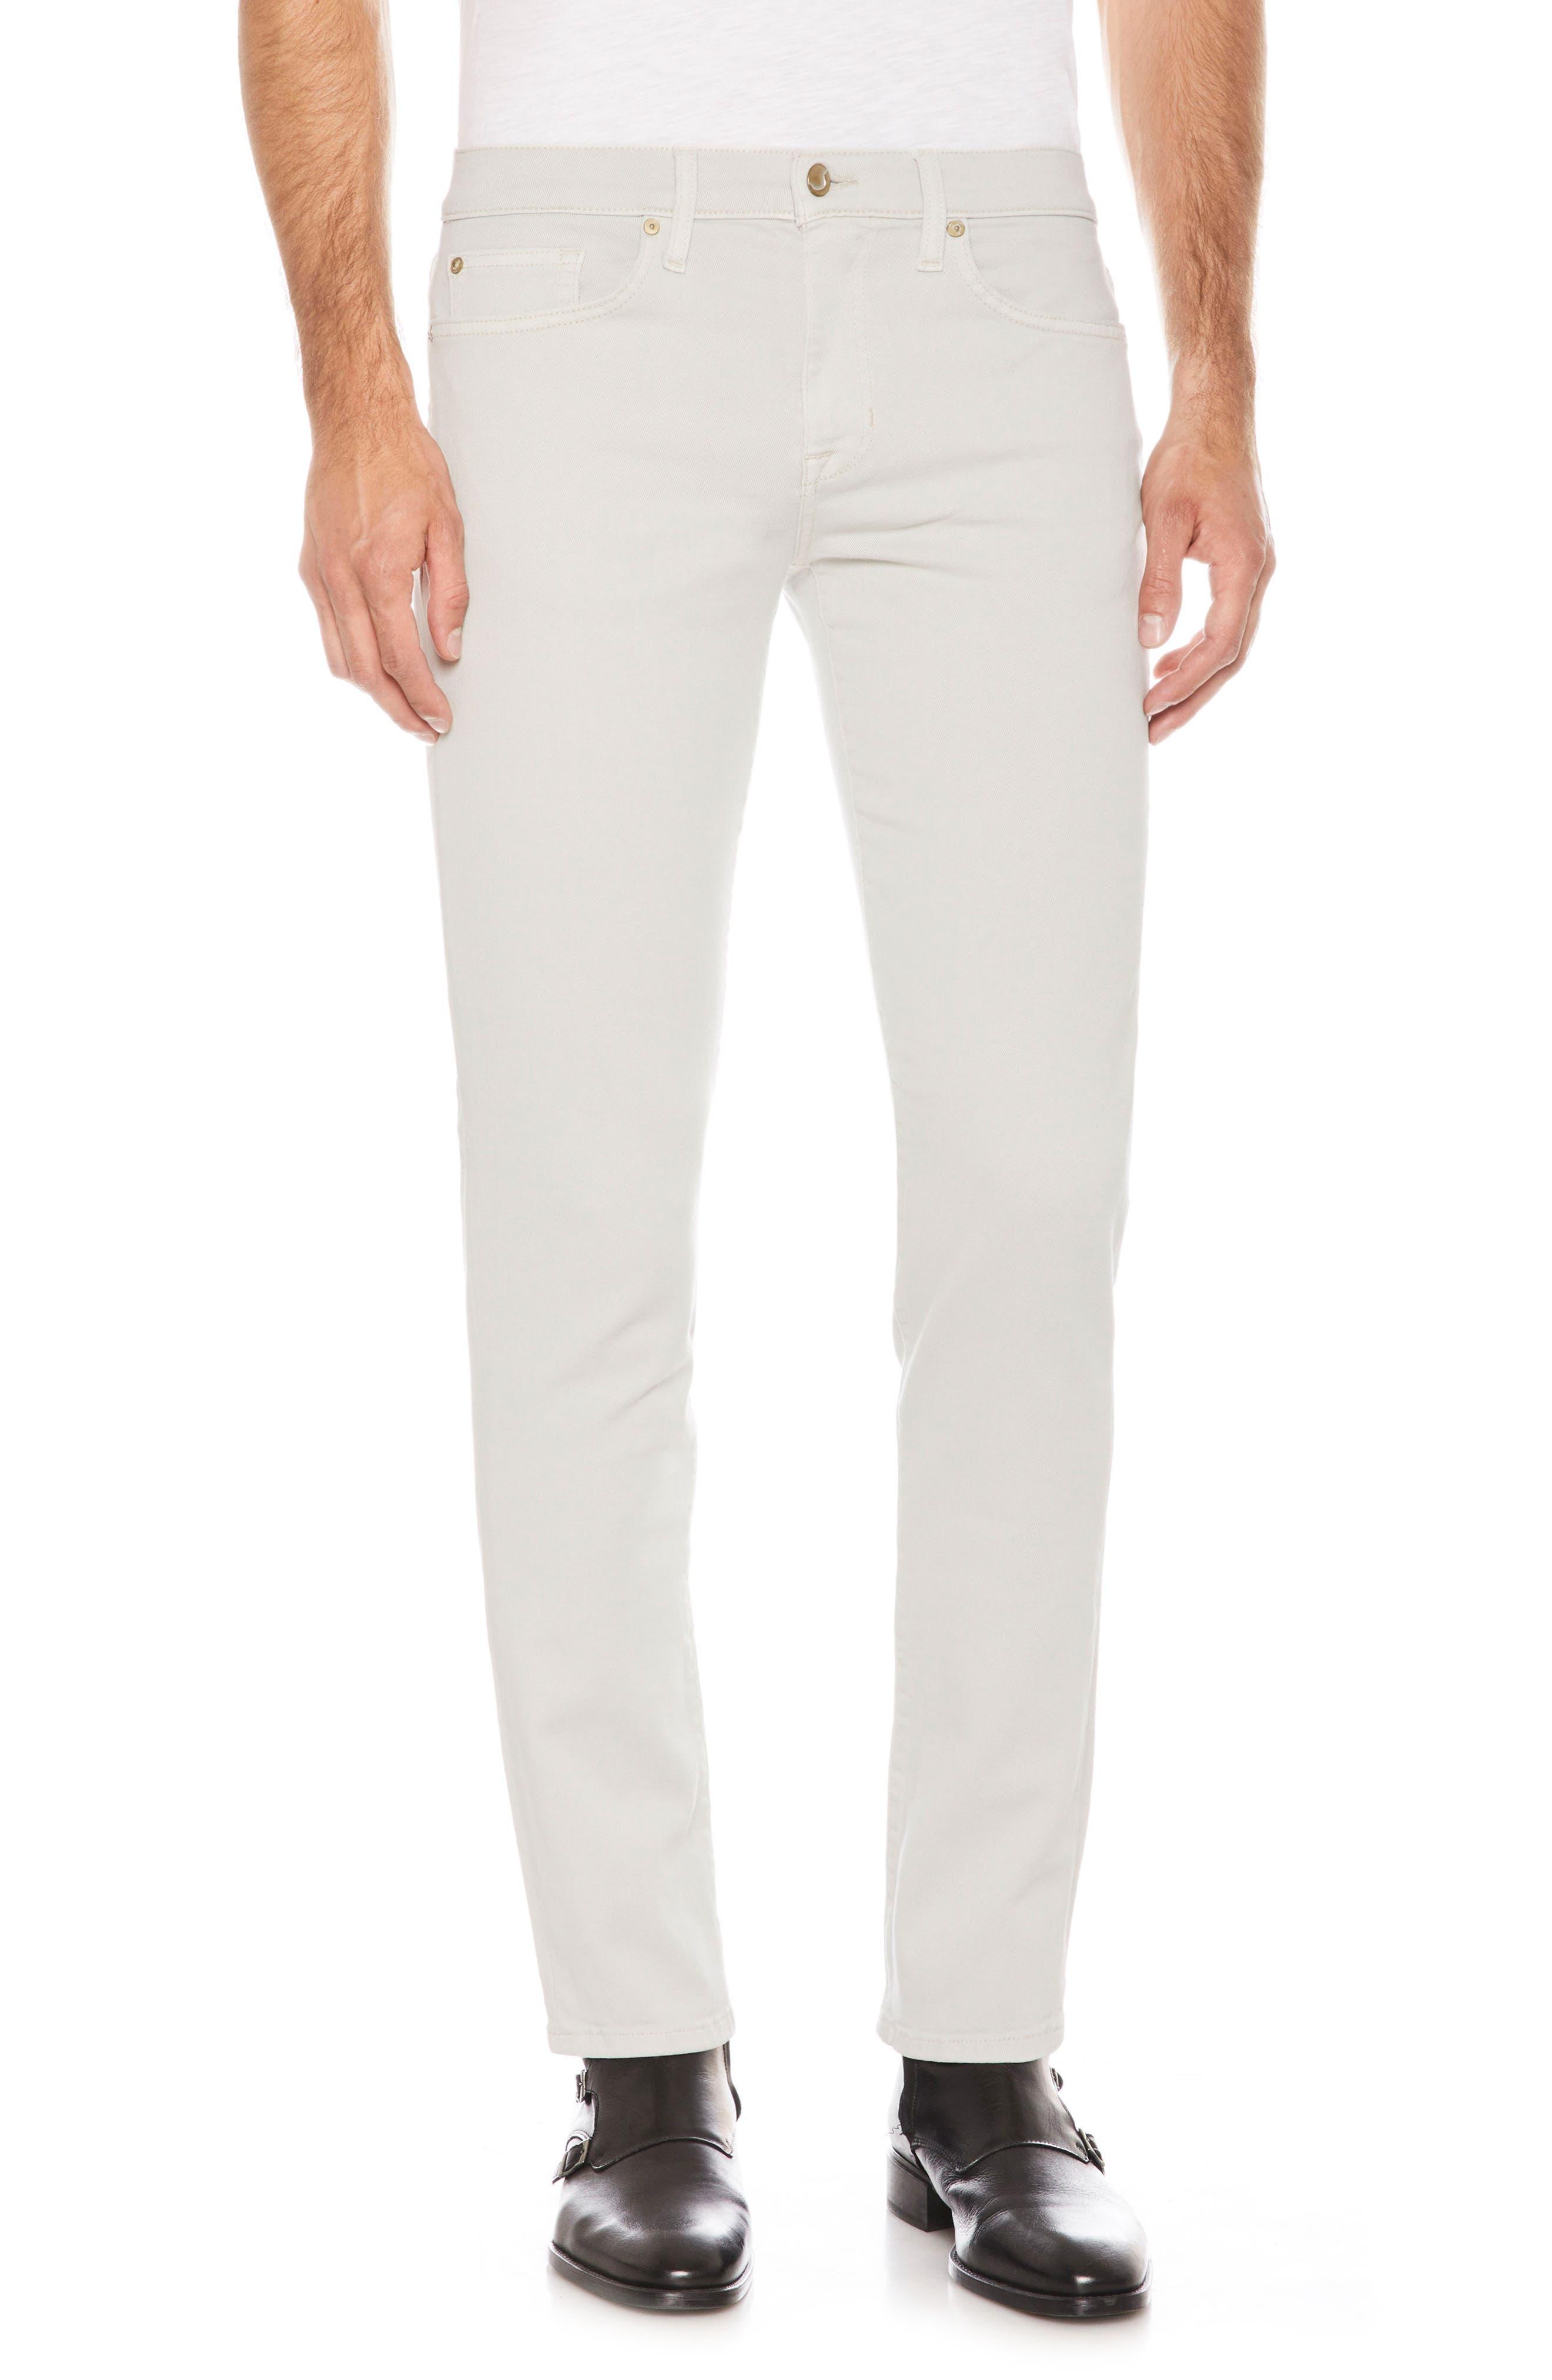 Brixton Slim Straight Leg Jeans,                         Main,                         color, Mancini